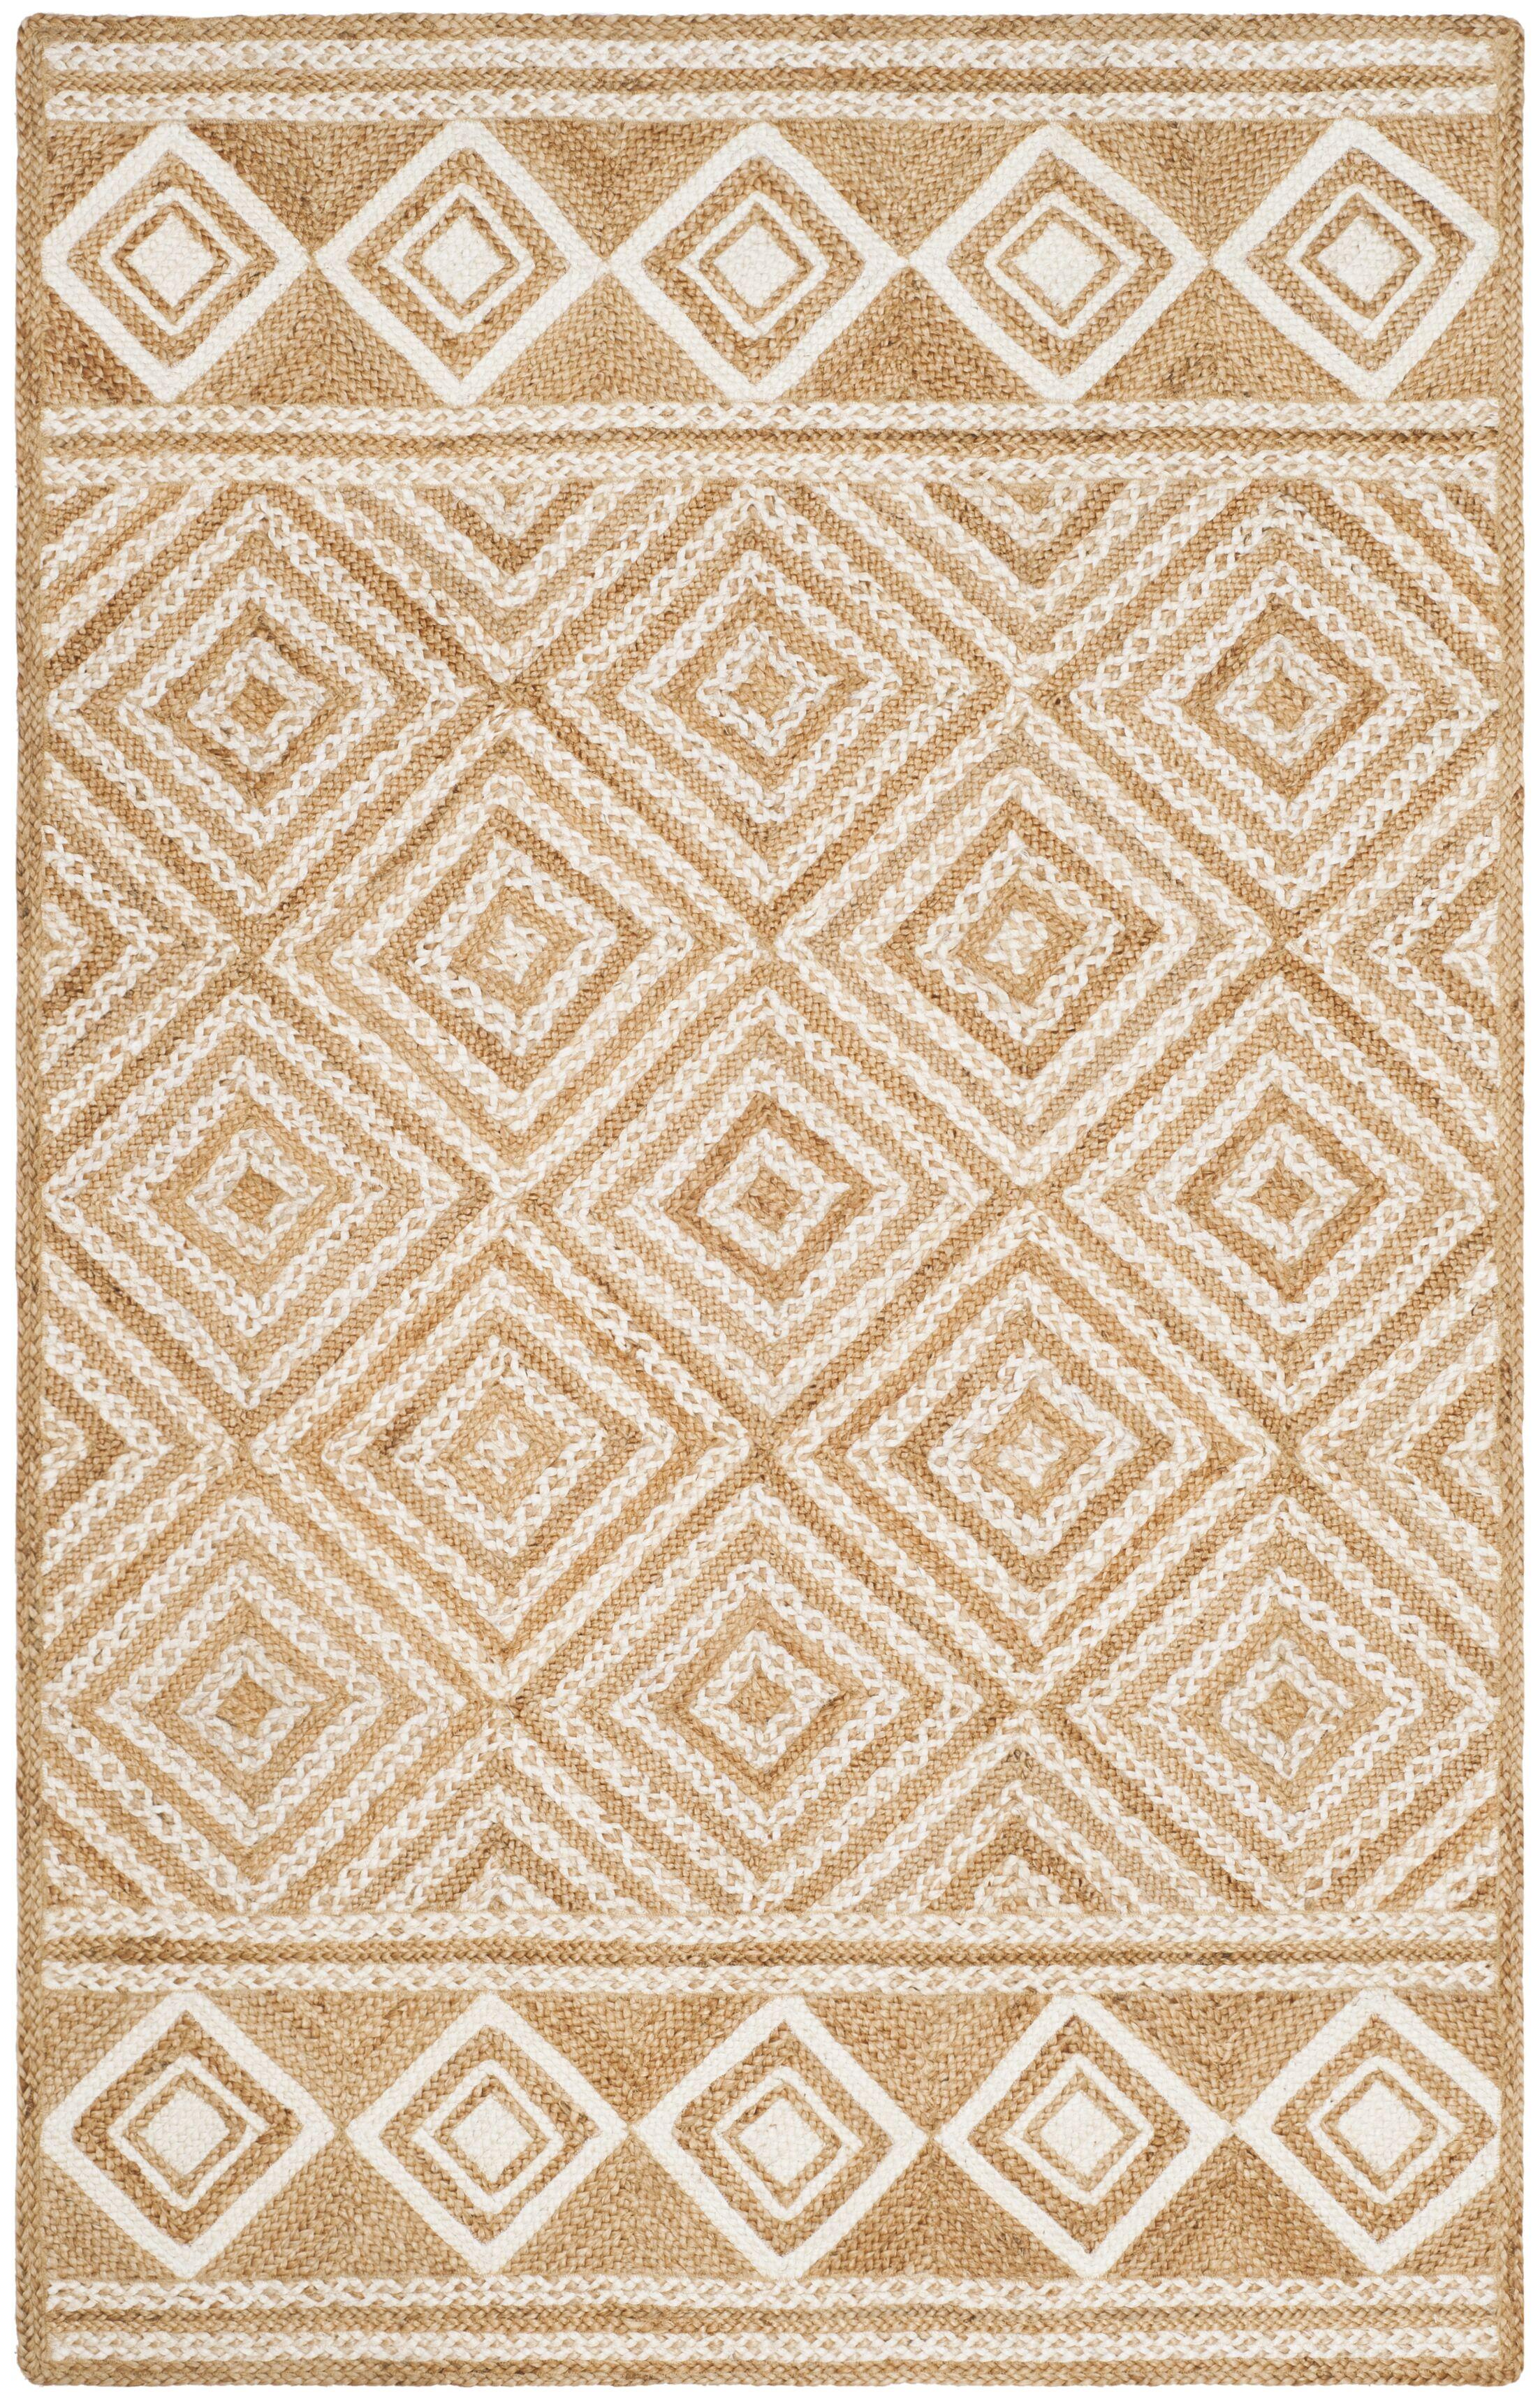 San Castle Natural Fiber Hand Woven Ivory Area Rug Rug Size: Square 6'